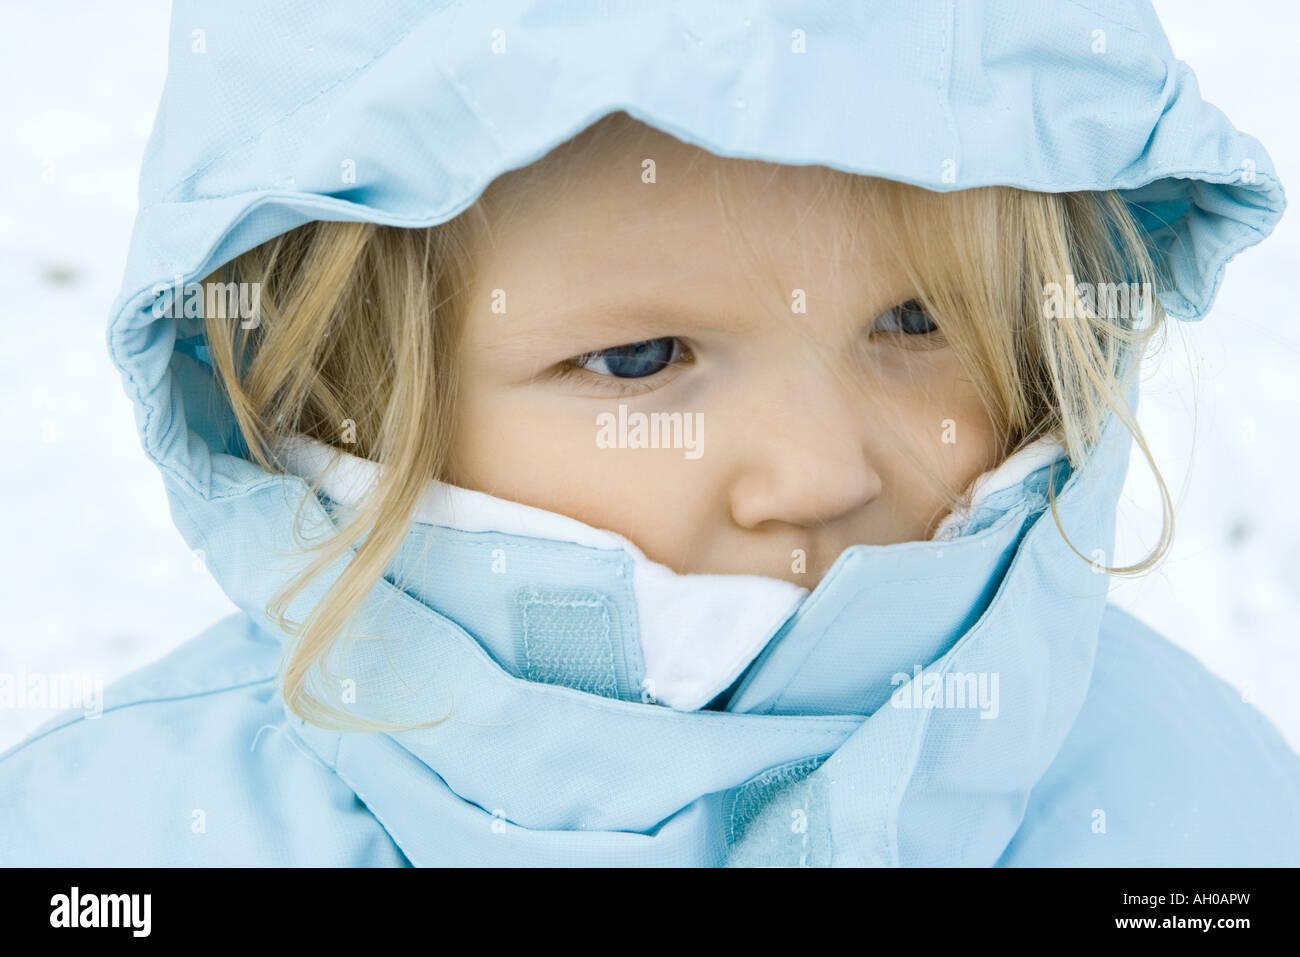 Toddler girl wearing winter coat, close-up, portrait - Stock Image